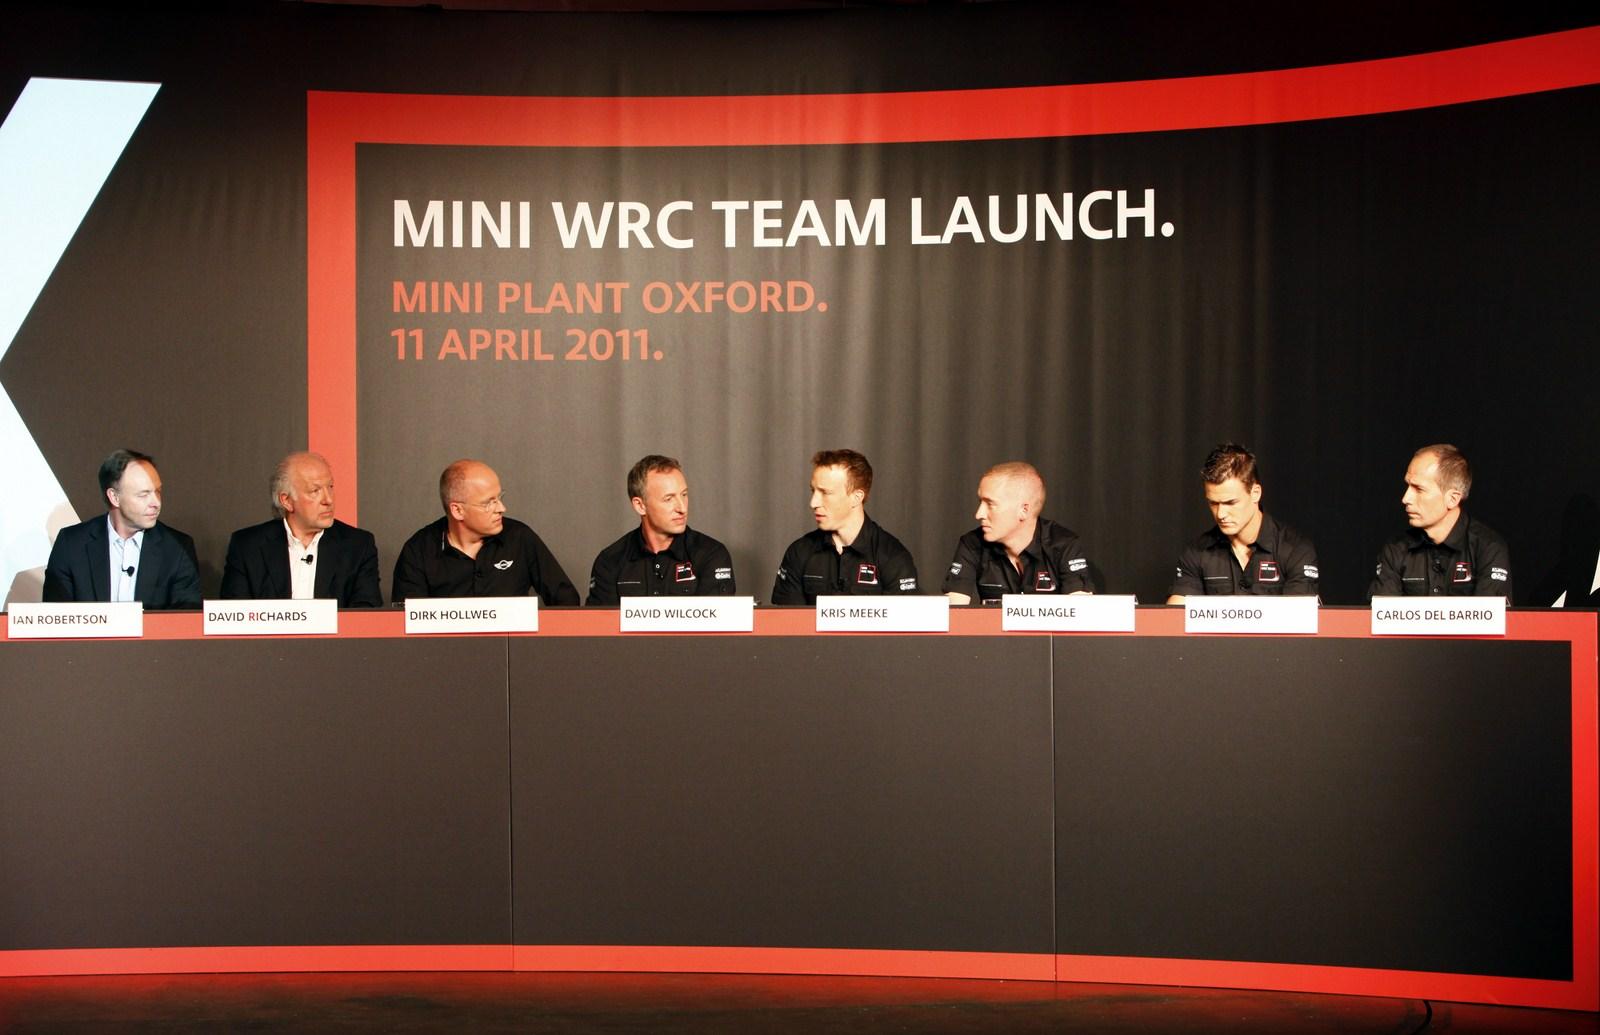 mini wrc official 5